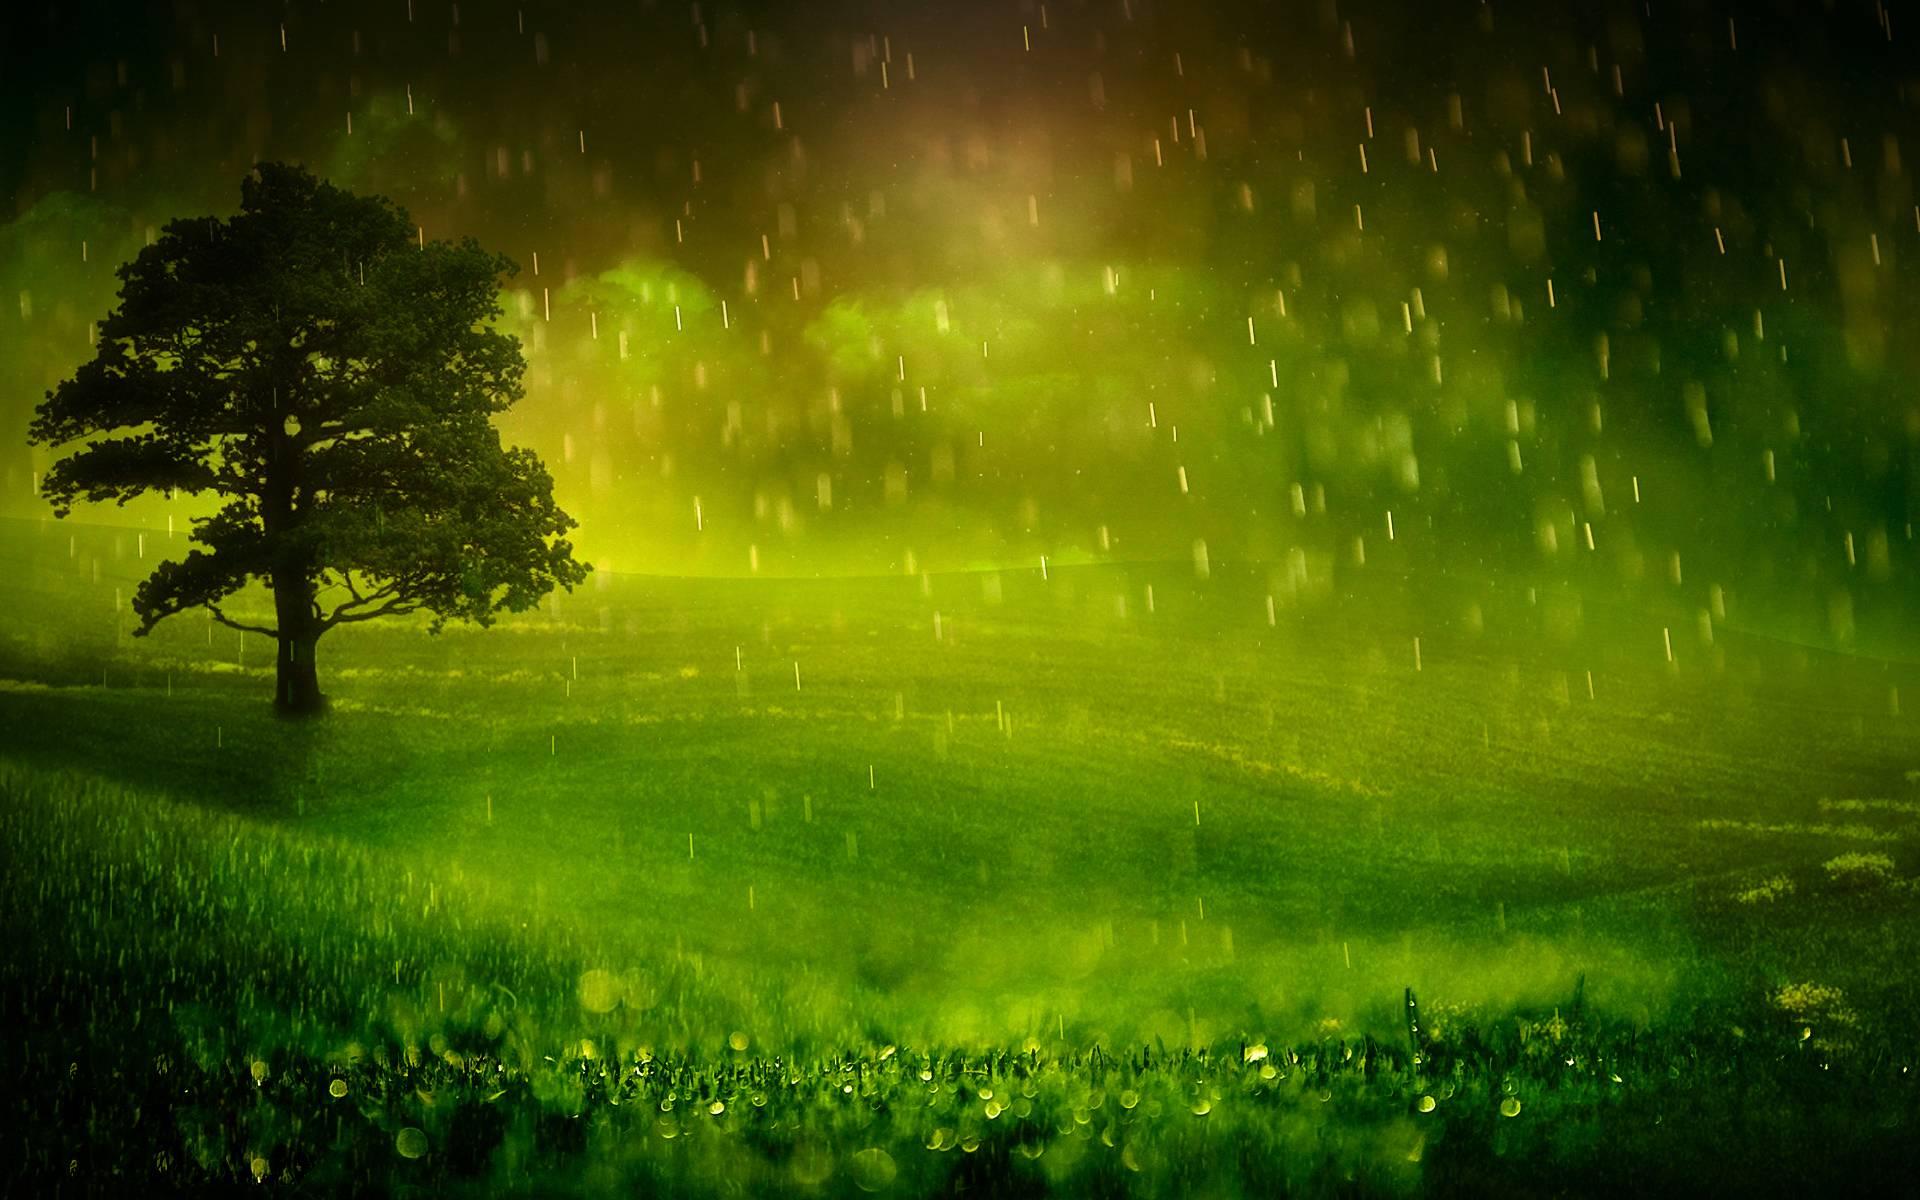 Nature Rain Wallpapers 1920x1200